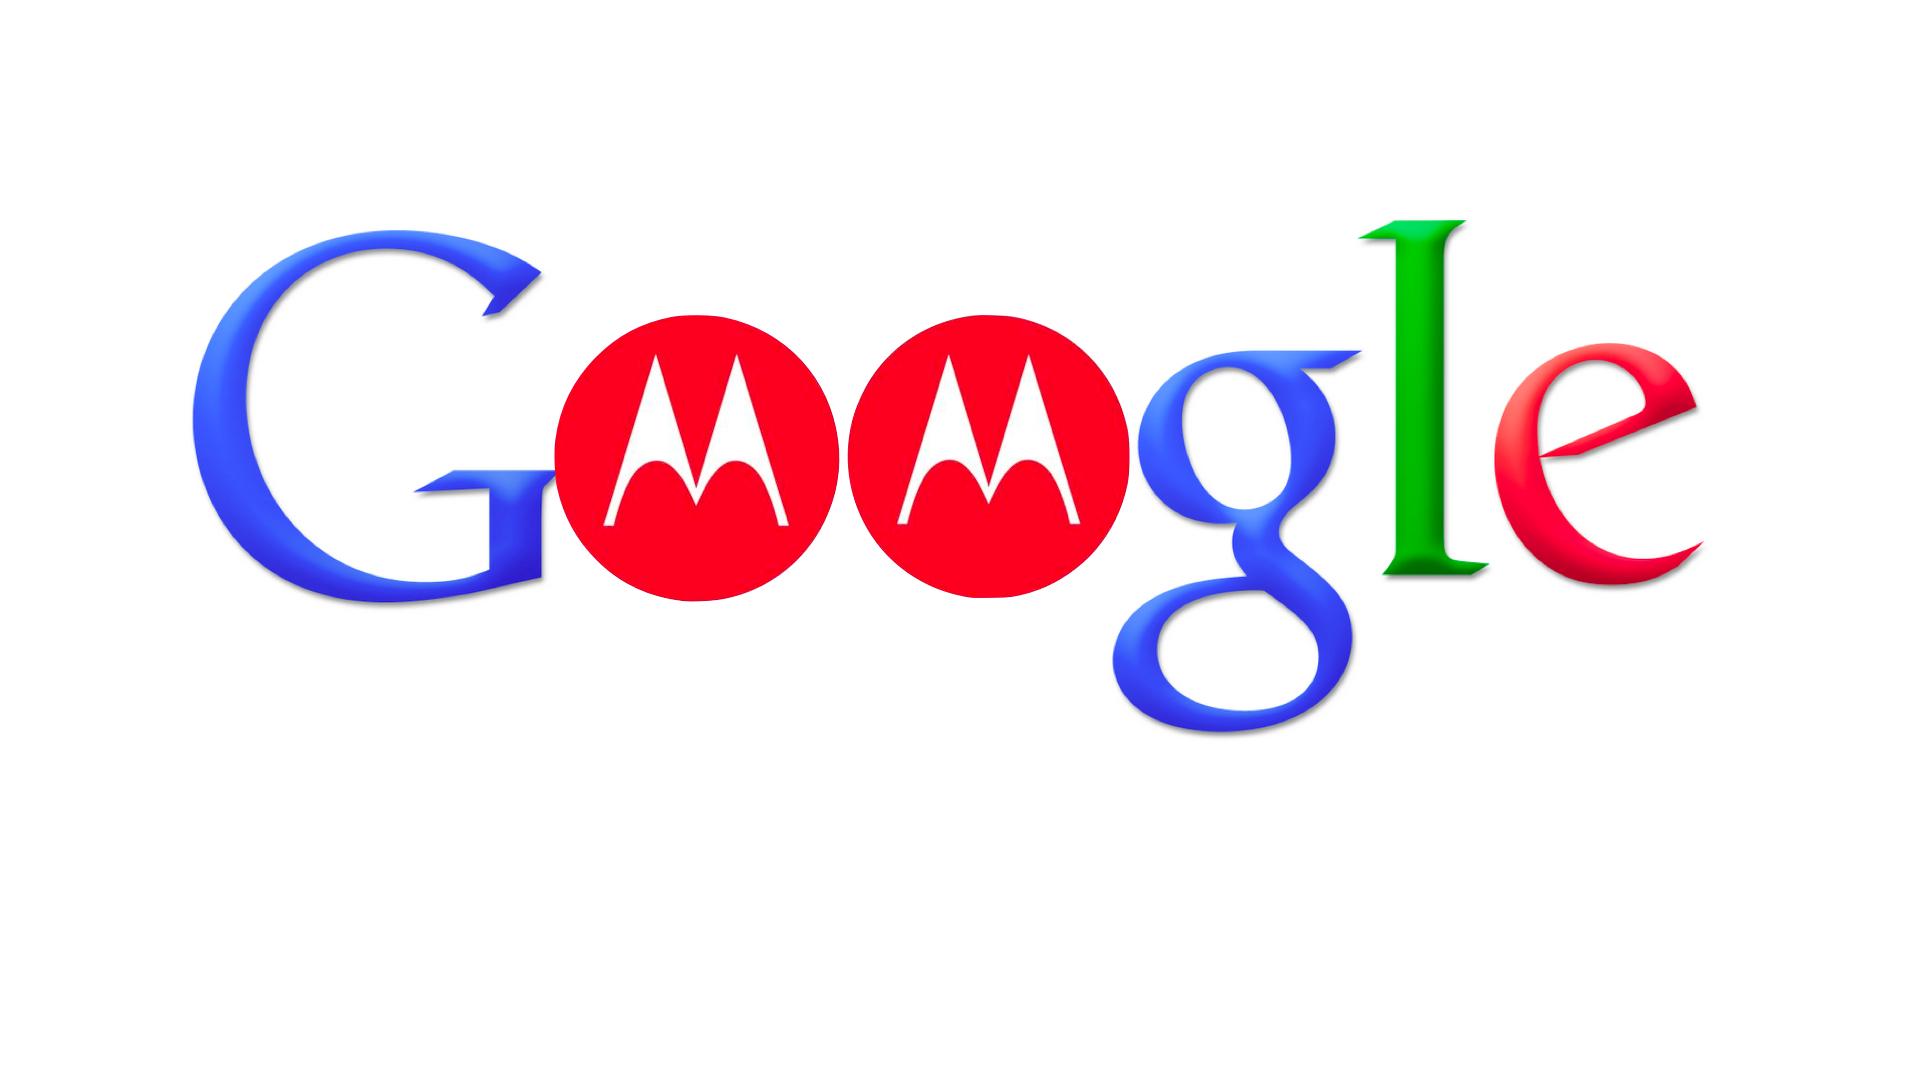 Google Motorola Mobility